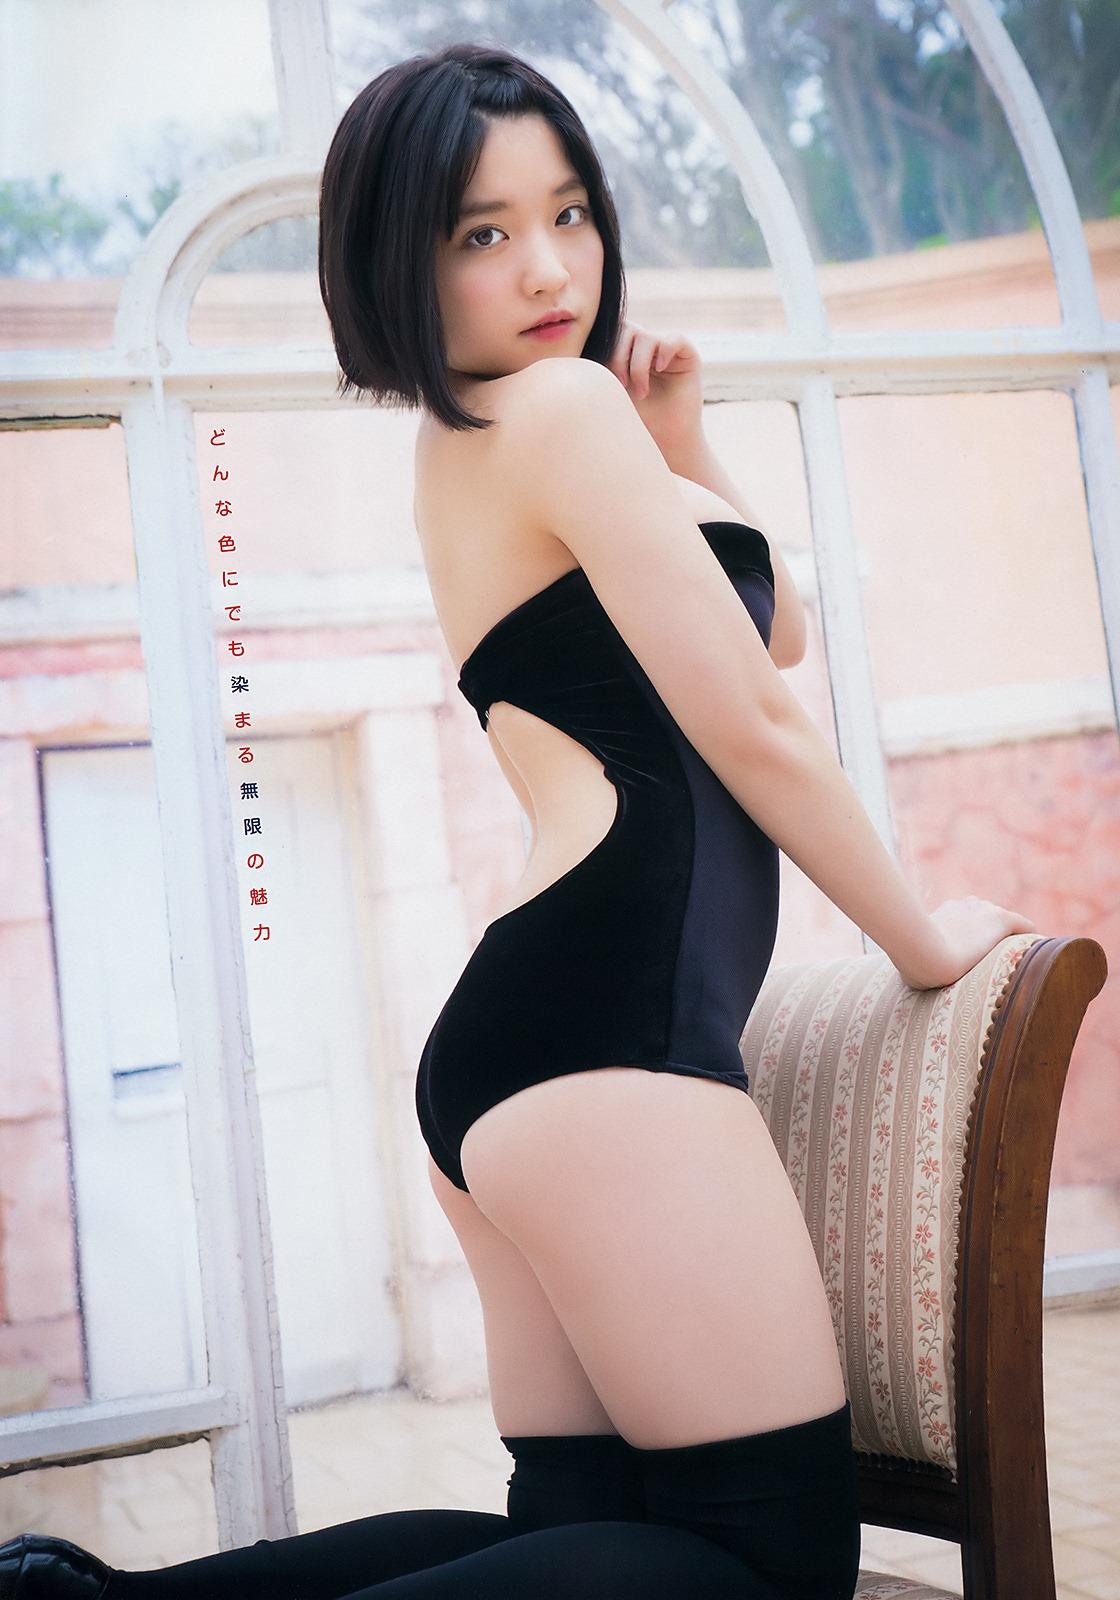 Magazine, Nemoto Nagi (根本凪), Young Animal